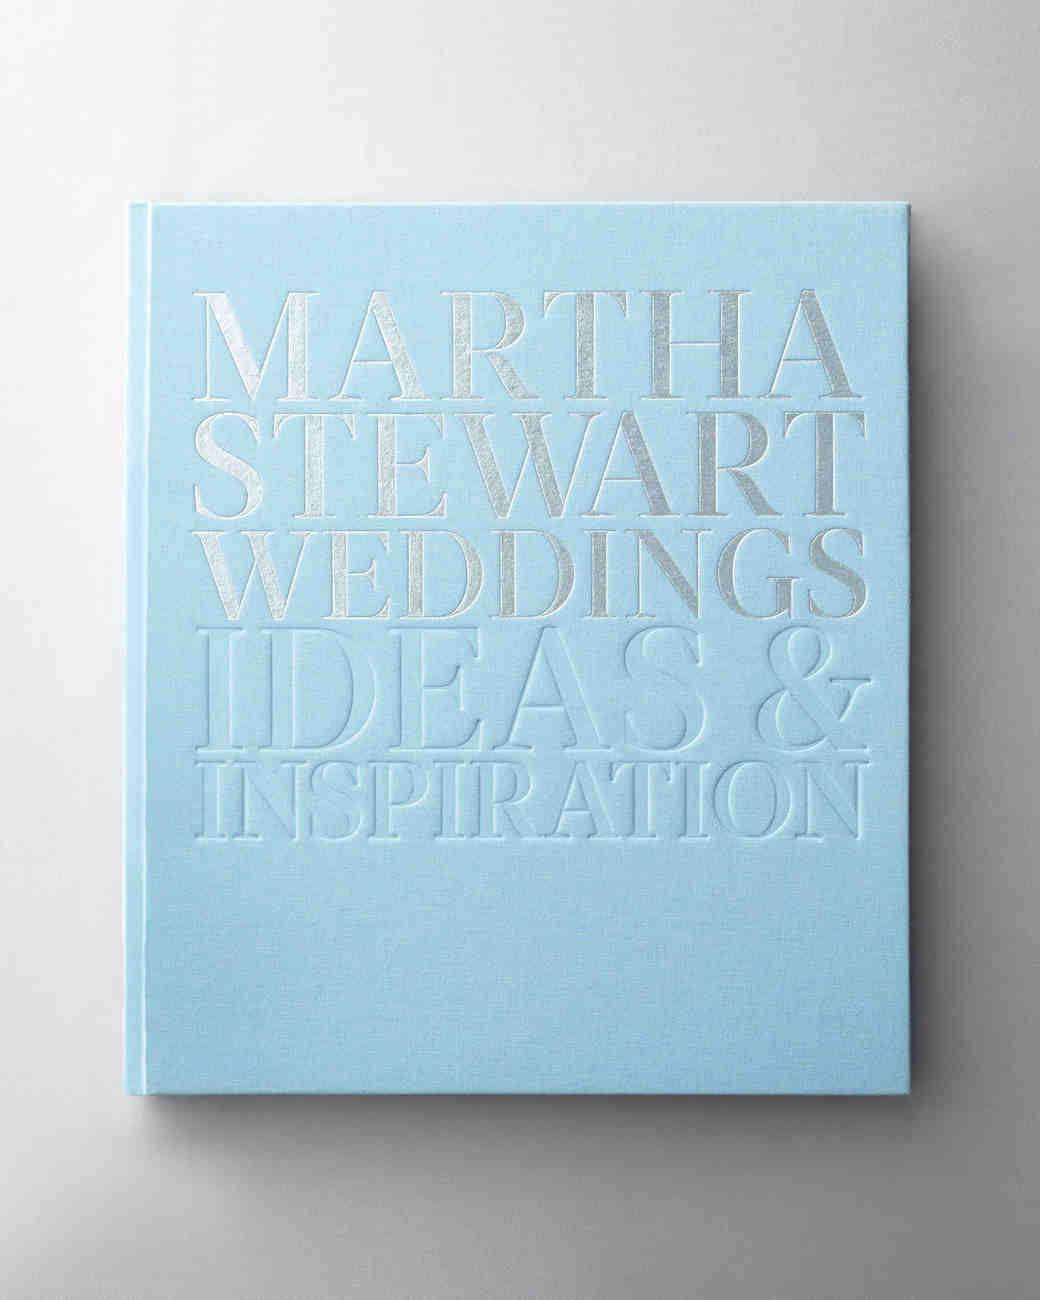 martha-stewart-weddings-book-2-143-d112474.jpg